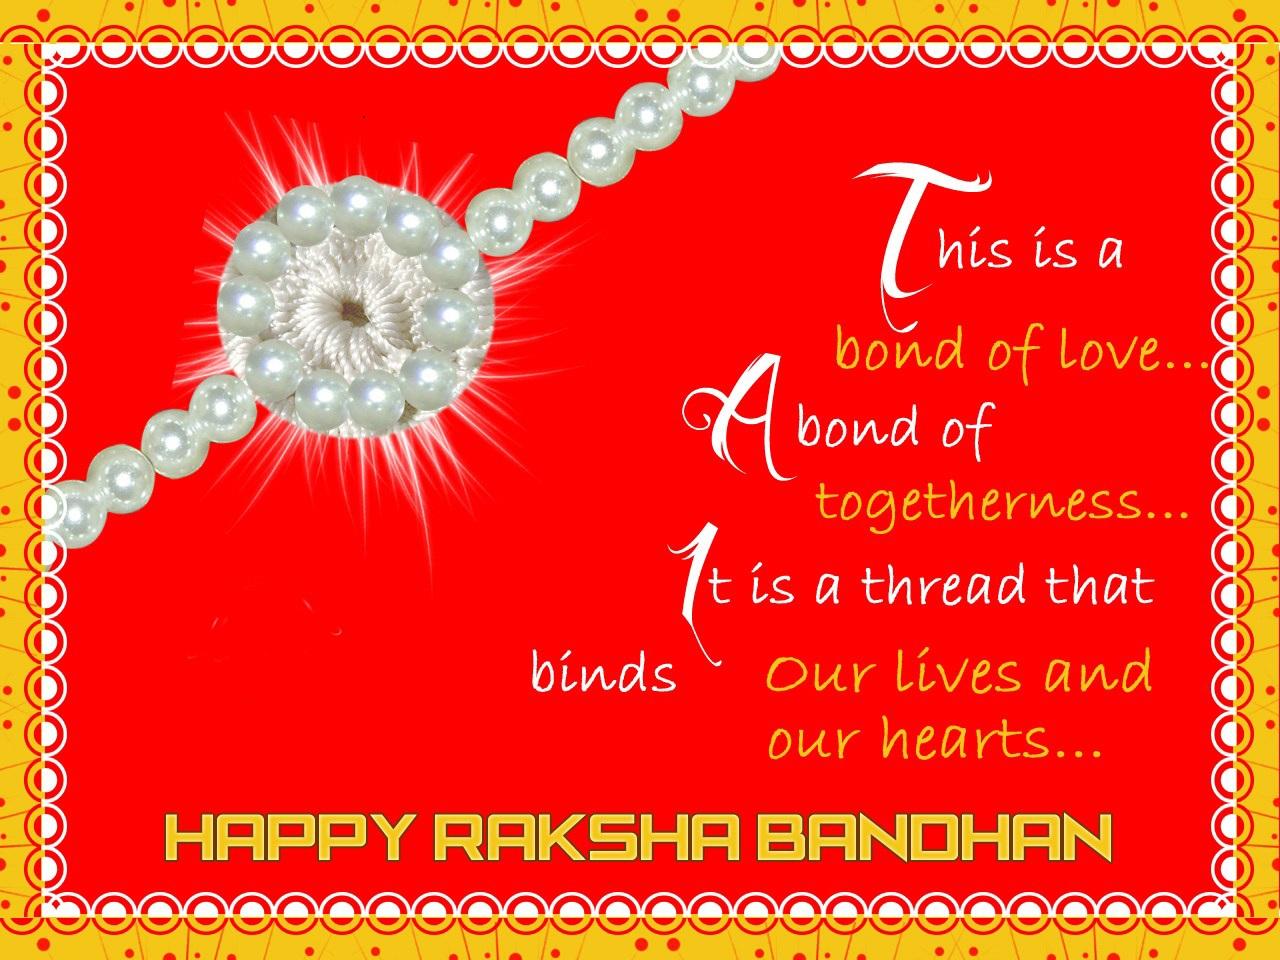 Happy raksha bandhan whatsapp status and facebook messages techicy happy raksha bandhan whatsapp status and messages m4hsunfo